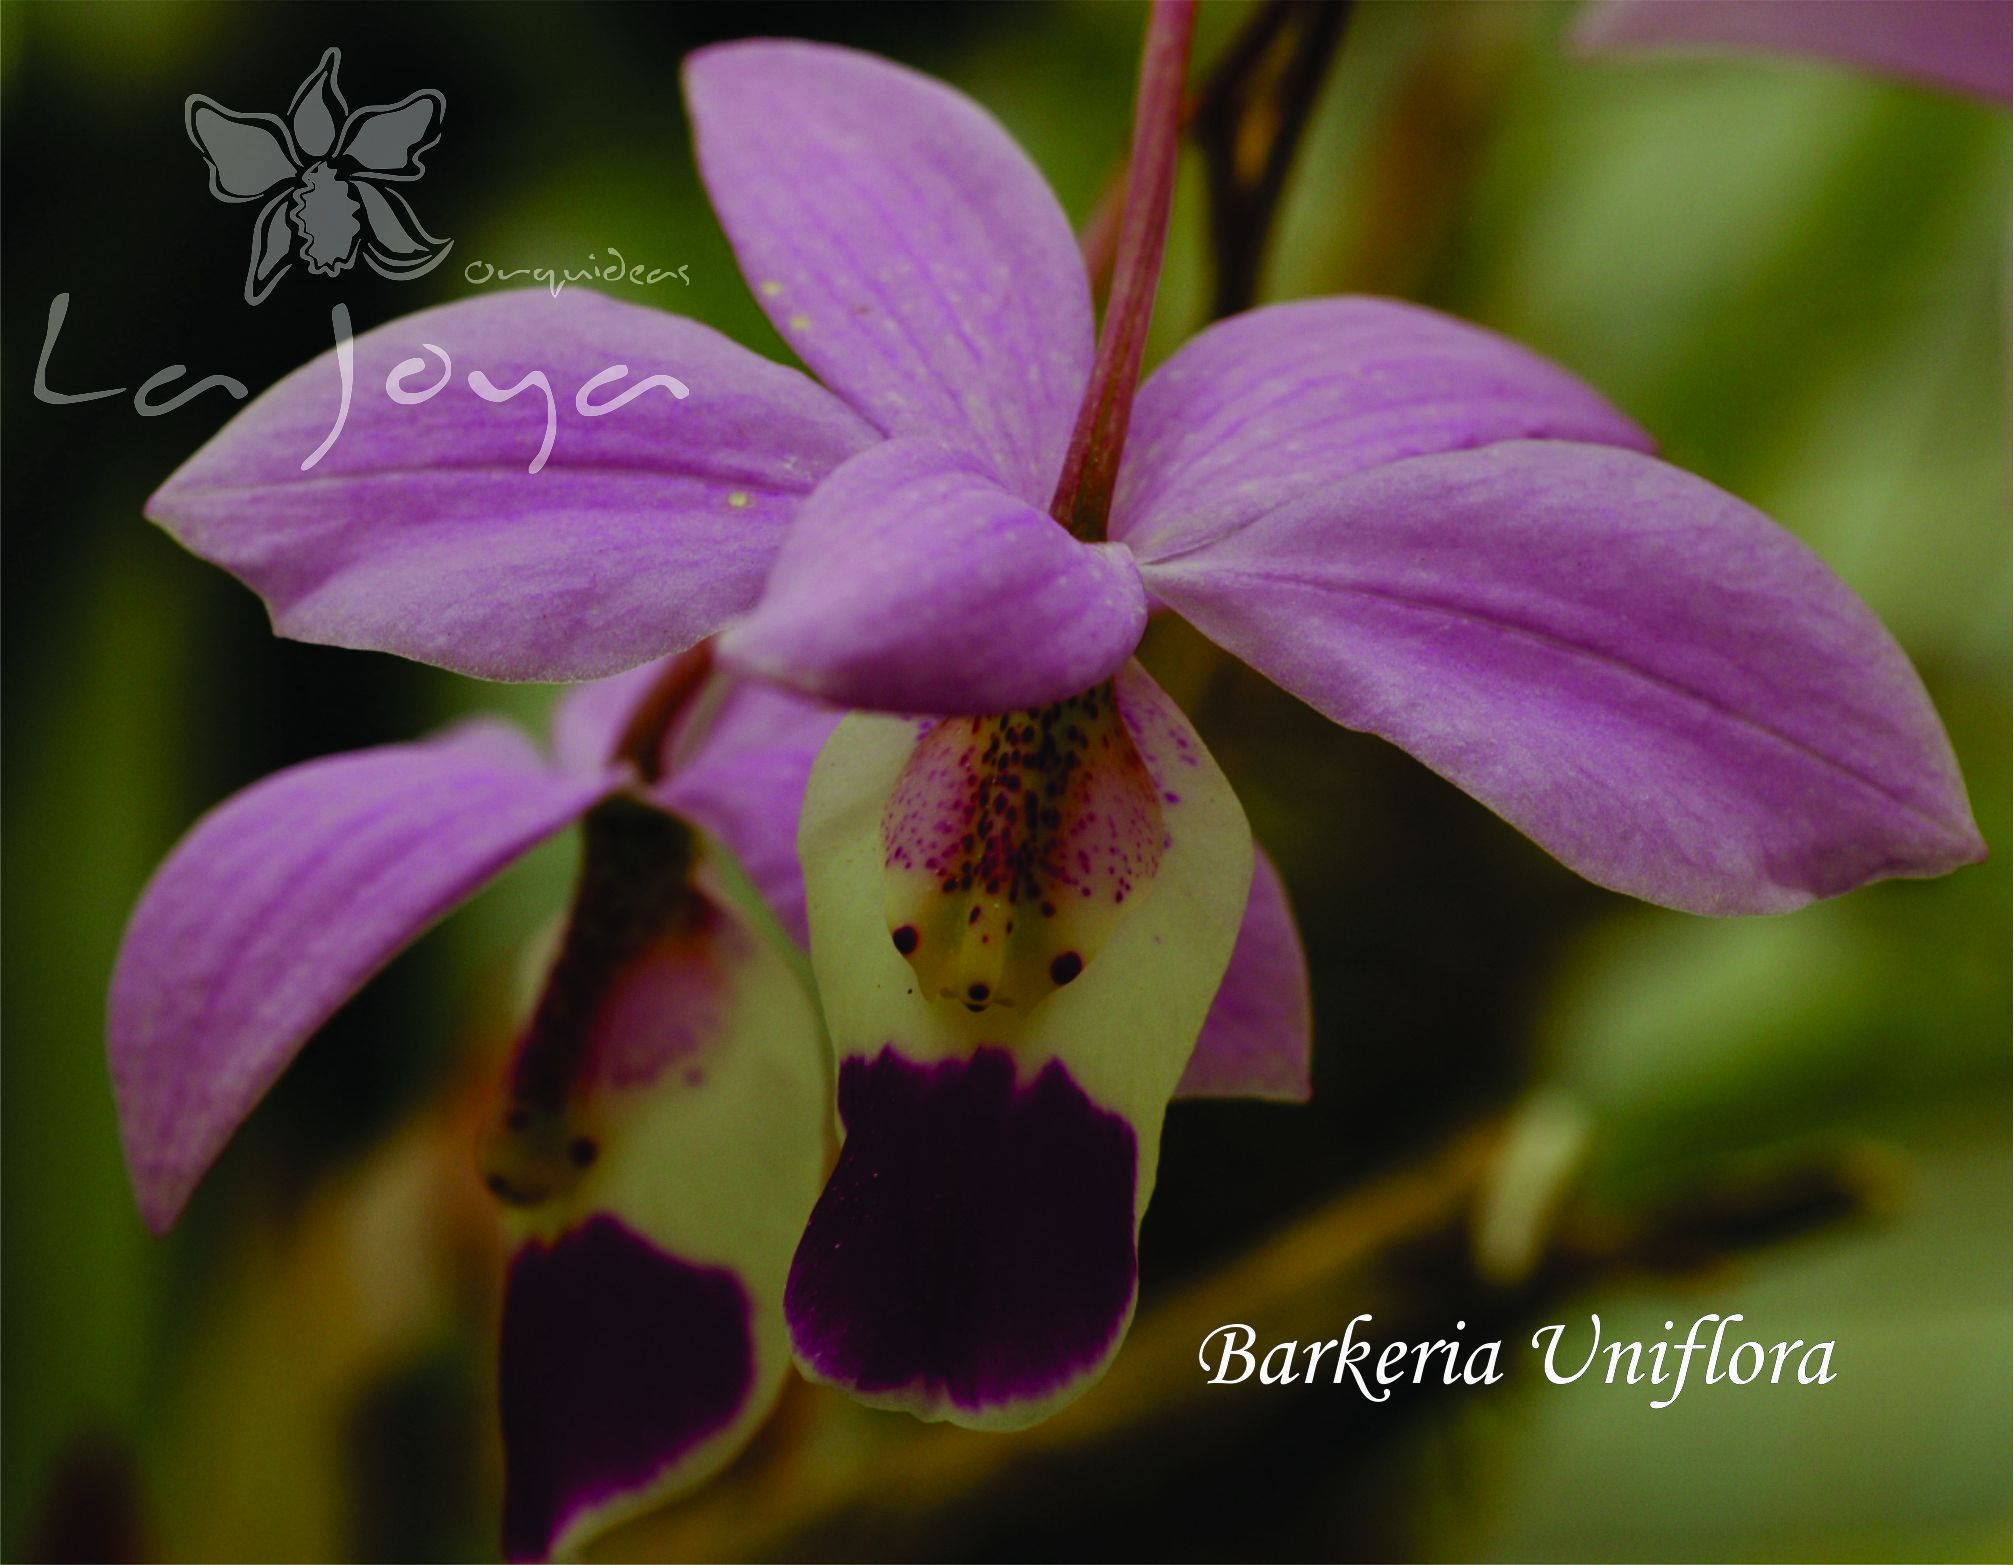 Barkeria Uniflora